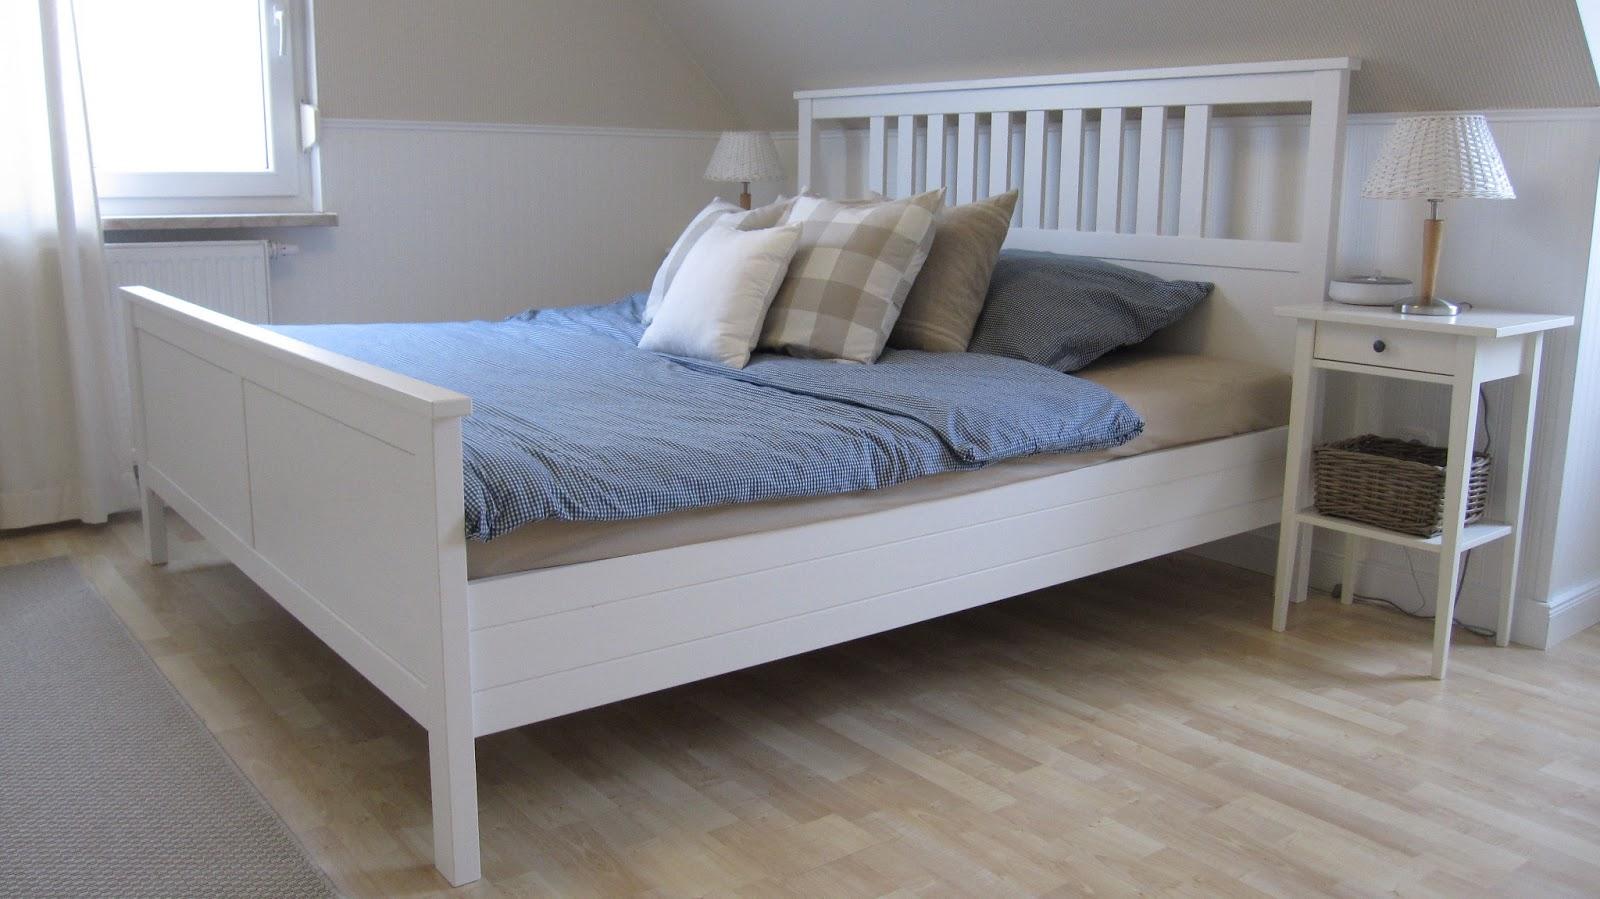 Pax Planer Schlafzimmer Ikea : Bett Schrank Ikea: Stuva Hochbettkomb Schubl  T Ren Wei Ikea Good Ideas